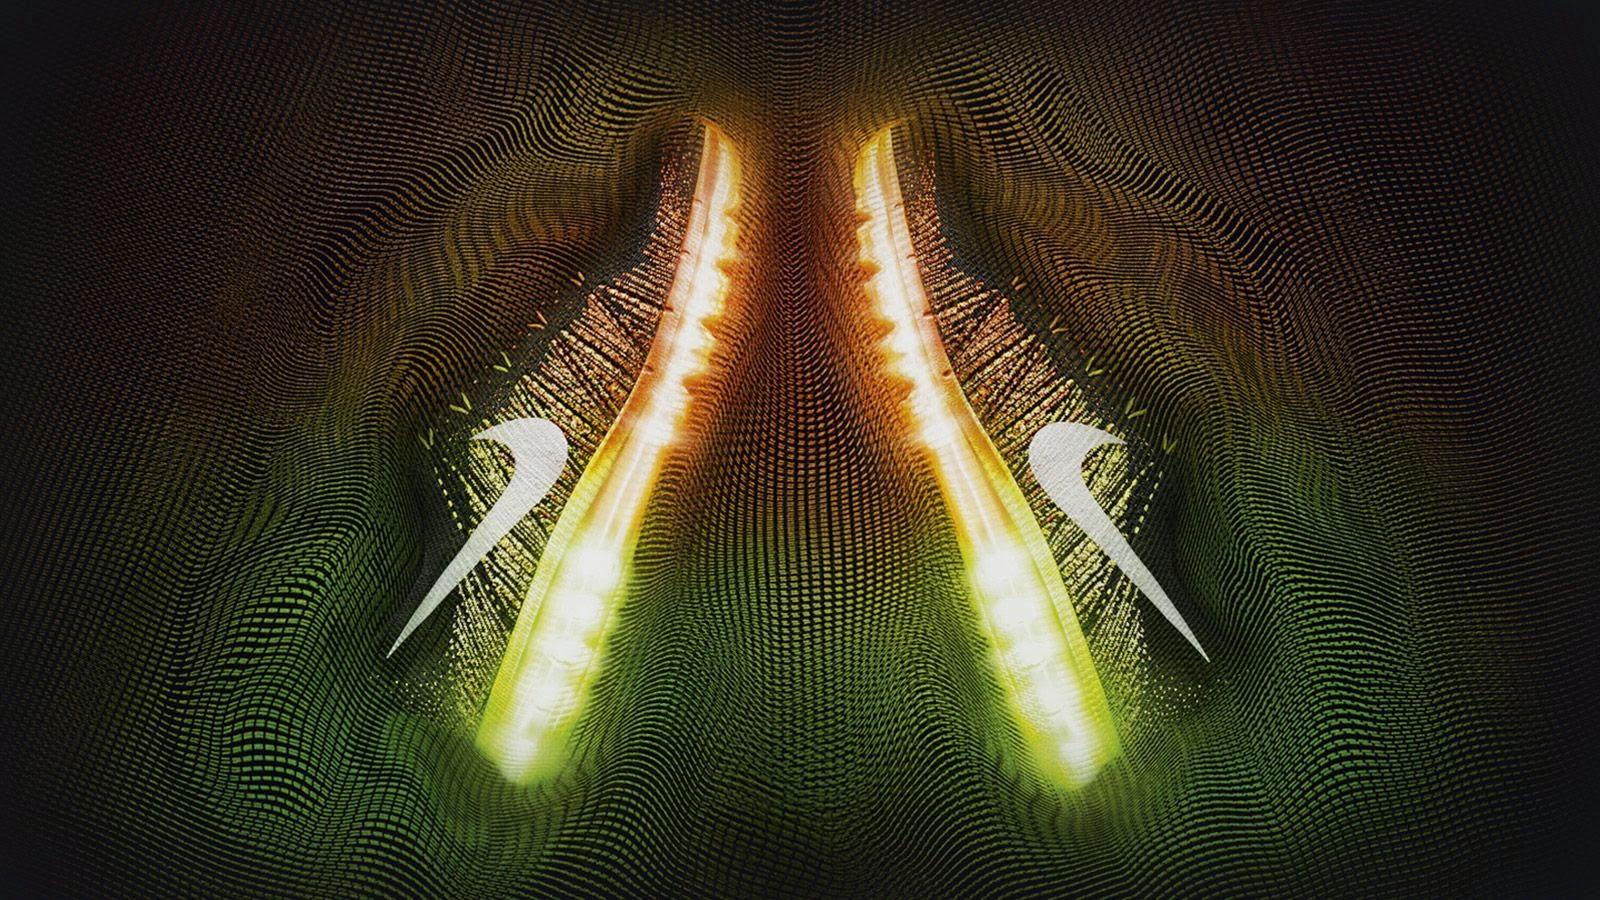 100% authentic 6e6ec 650e8 Nike Flyknit Air Max